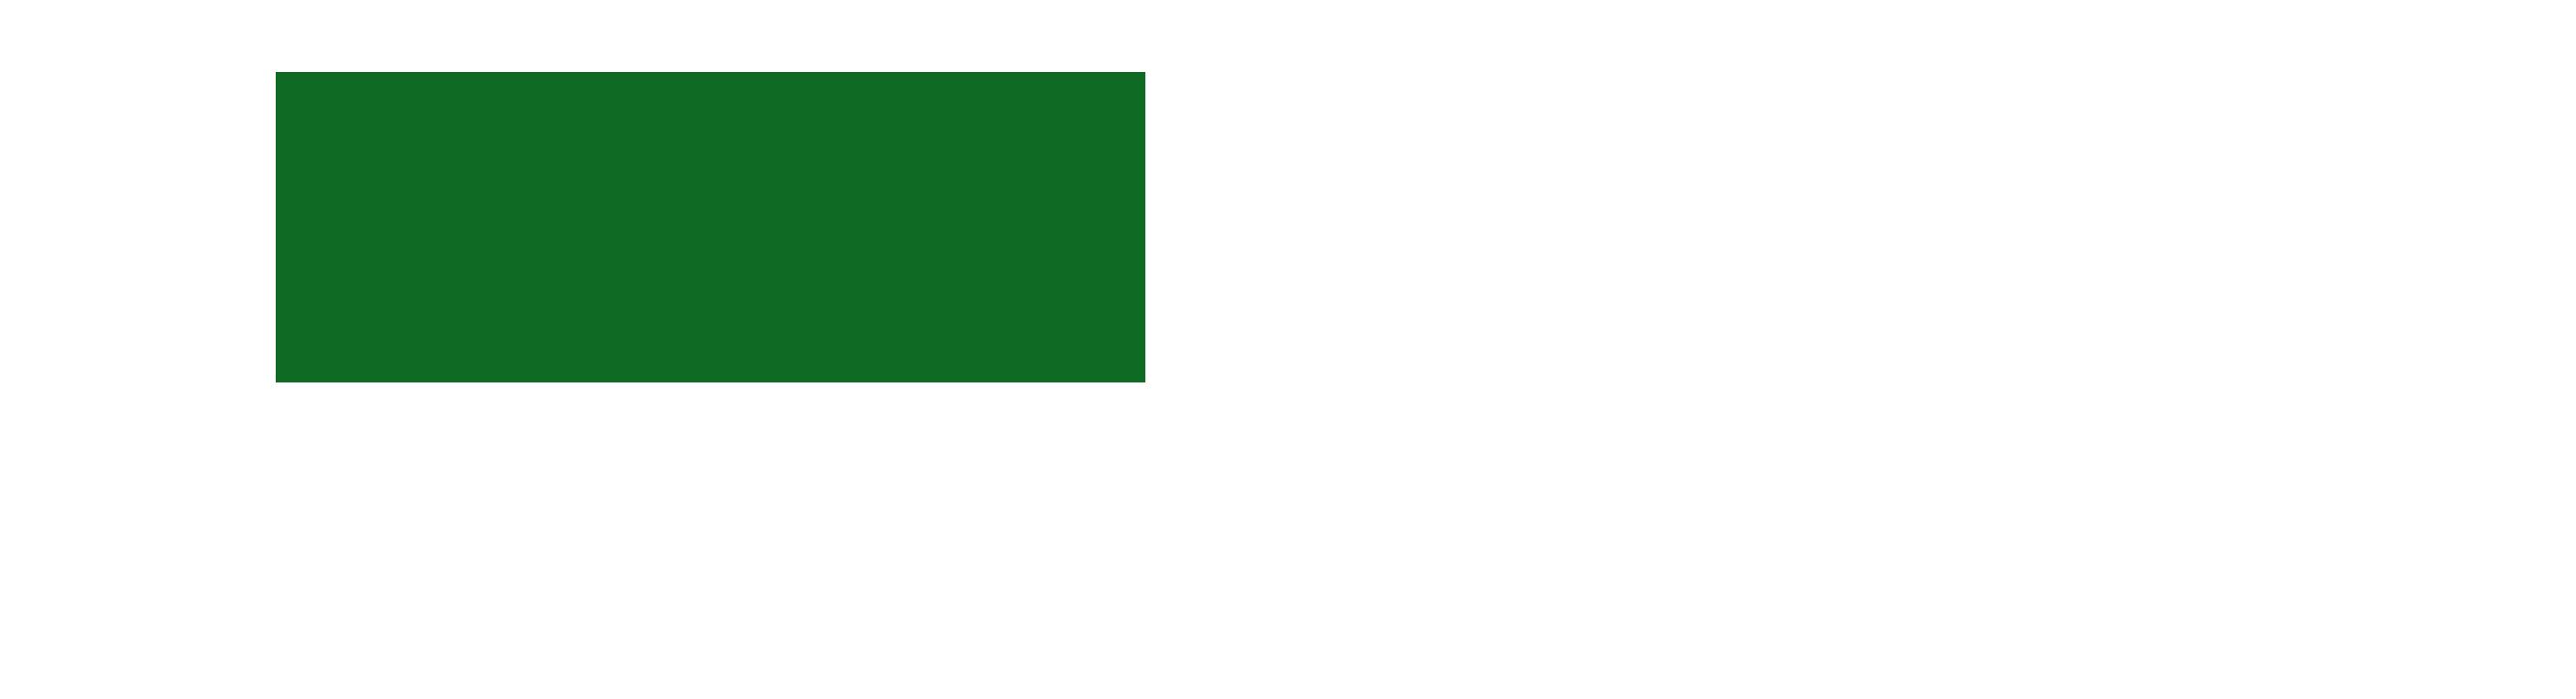 SLIDE compost 2019 a.png